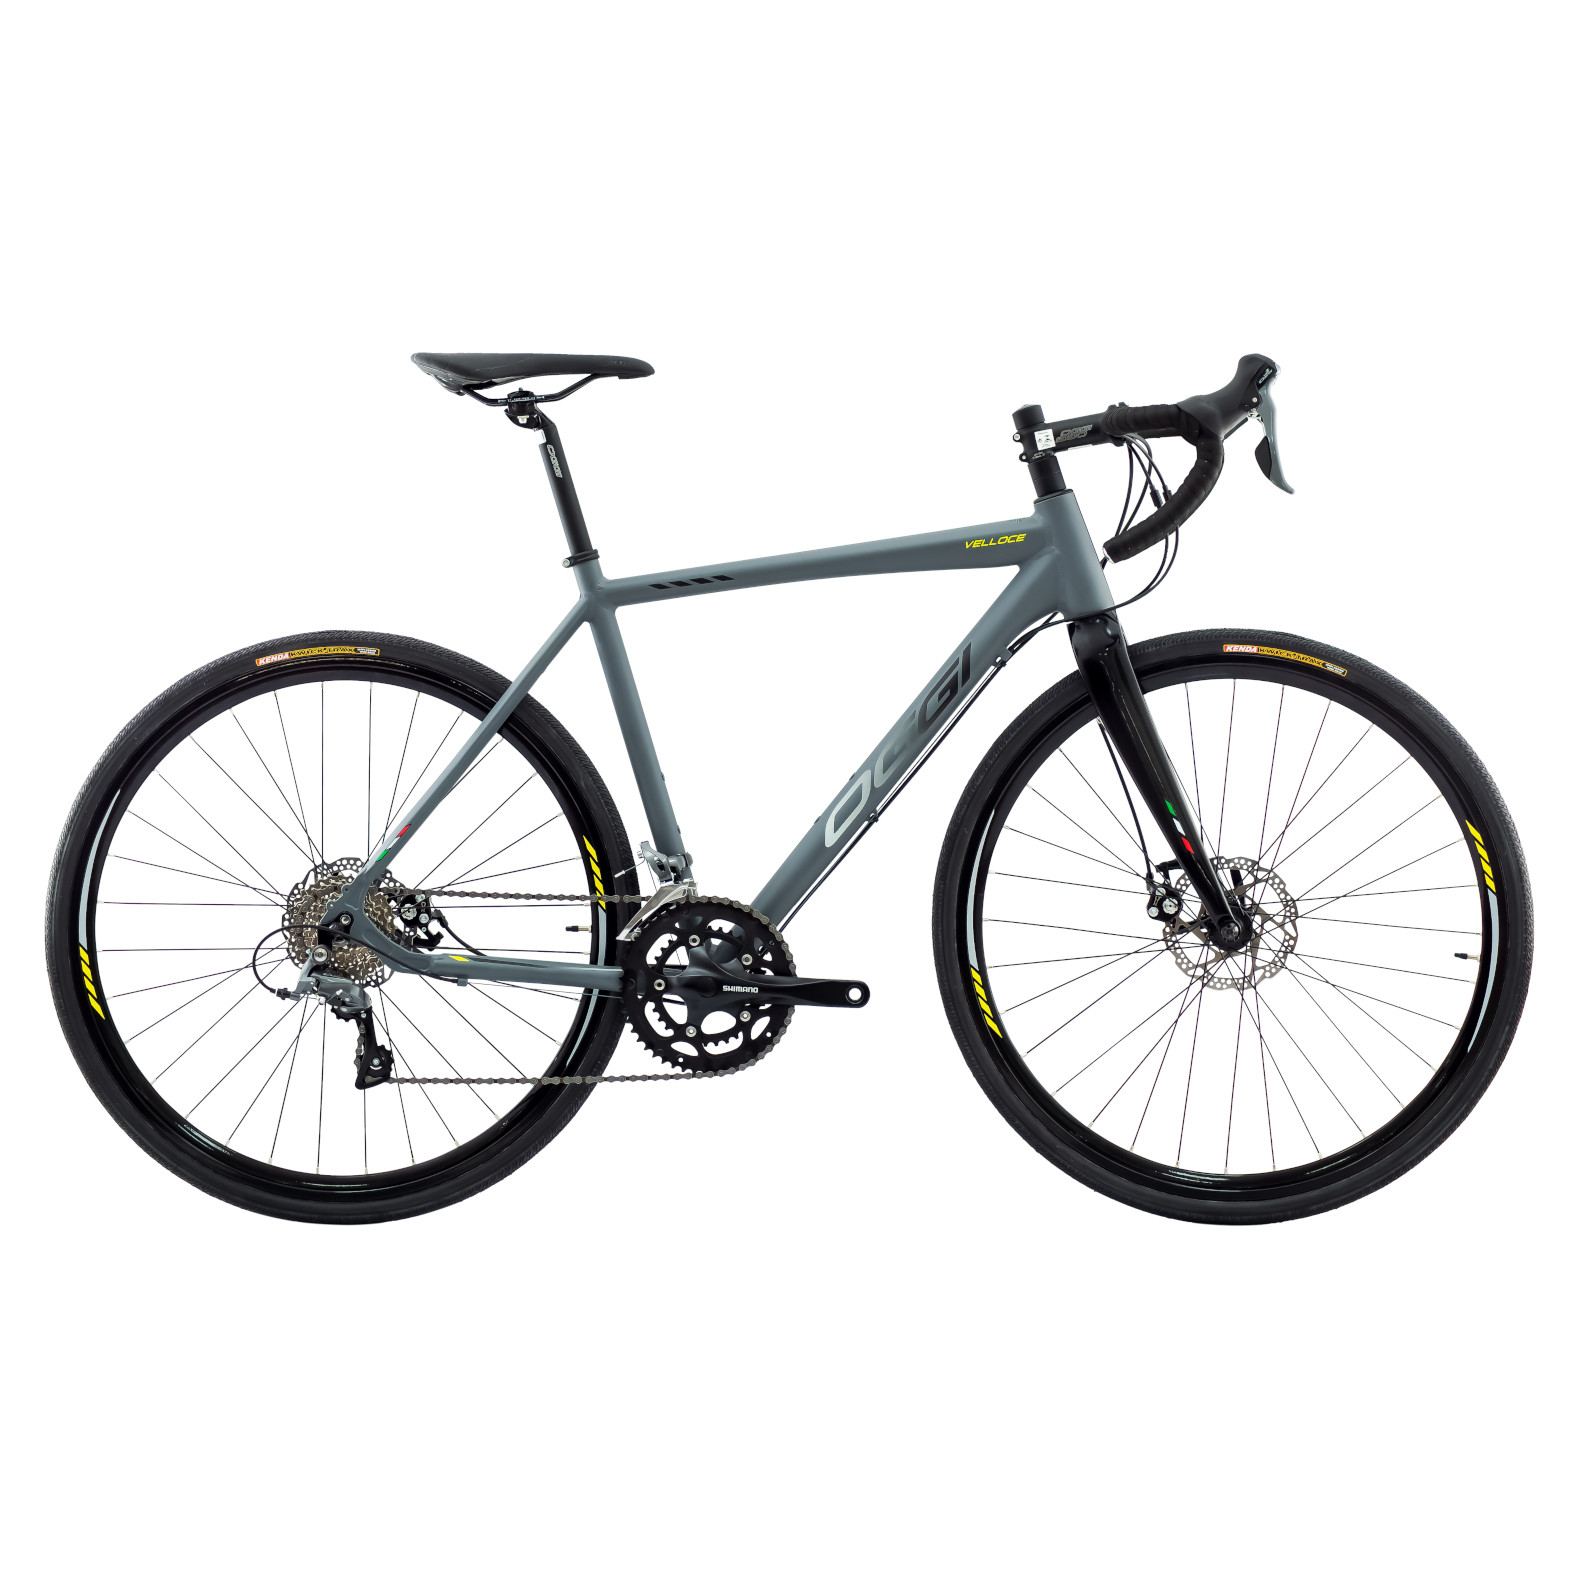 Bicicleta Speed Oggi Velloce Disc 16v 2022